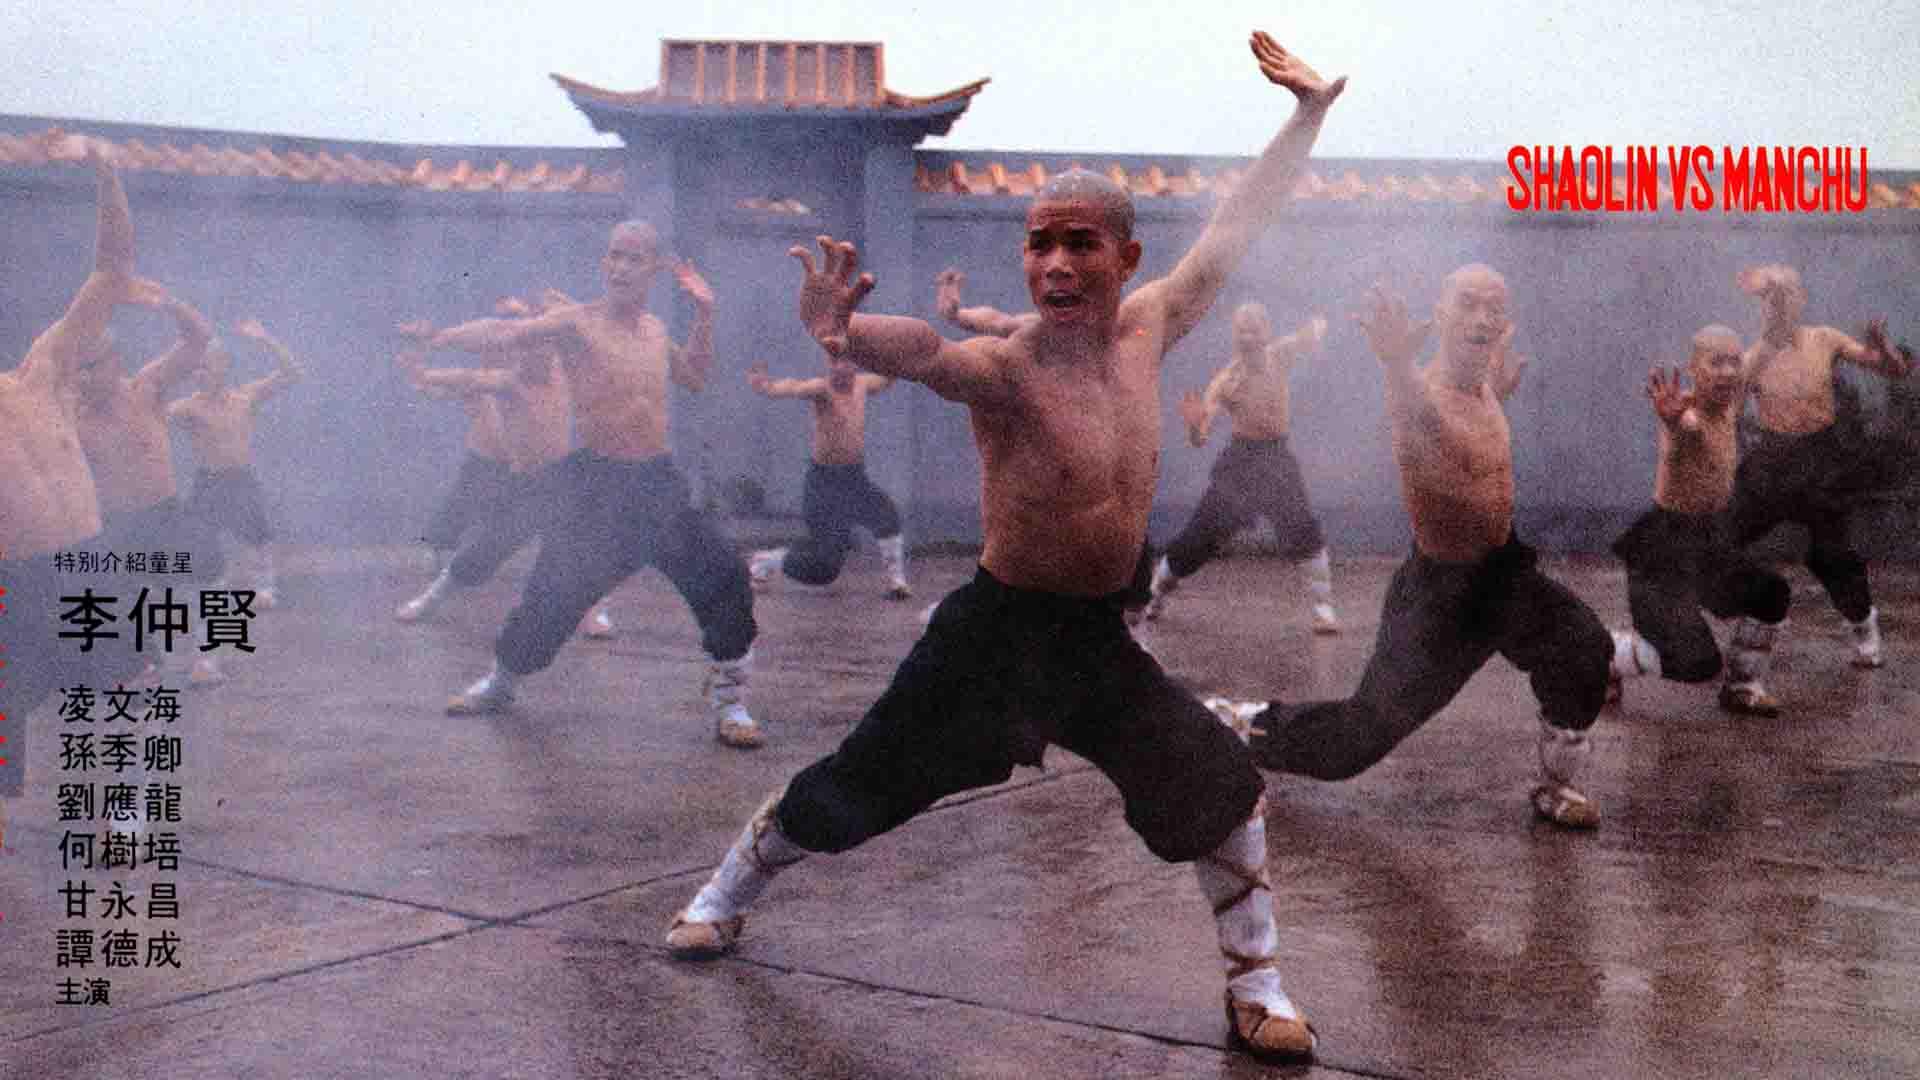 Shaolin vs Manchu